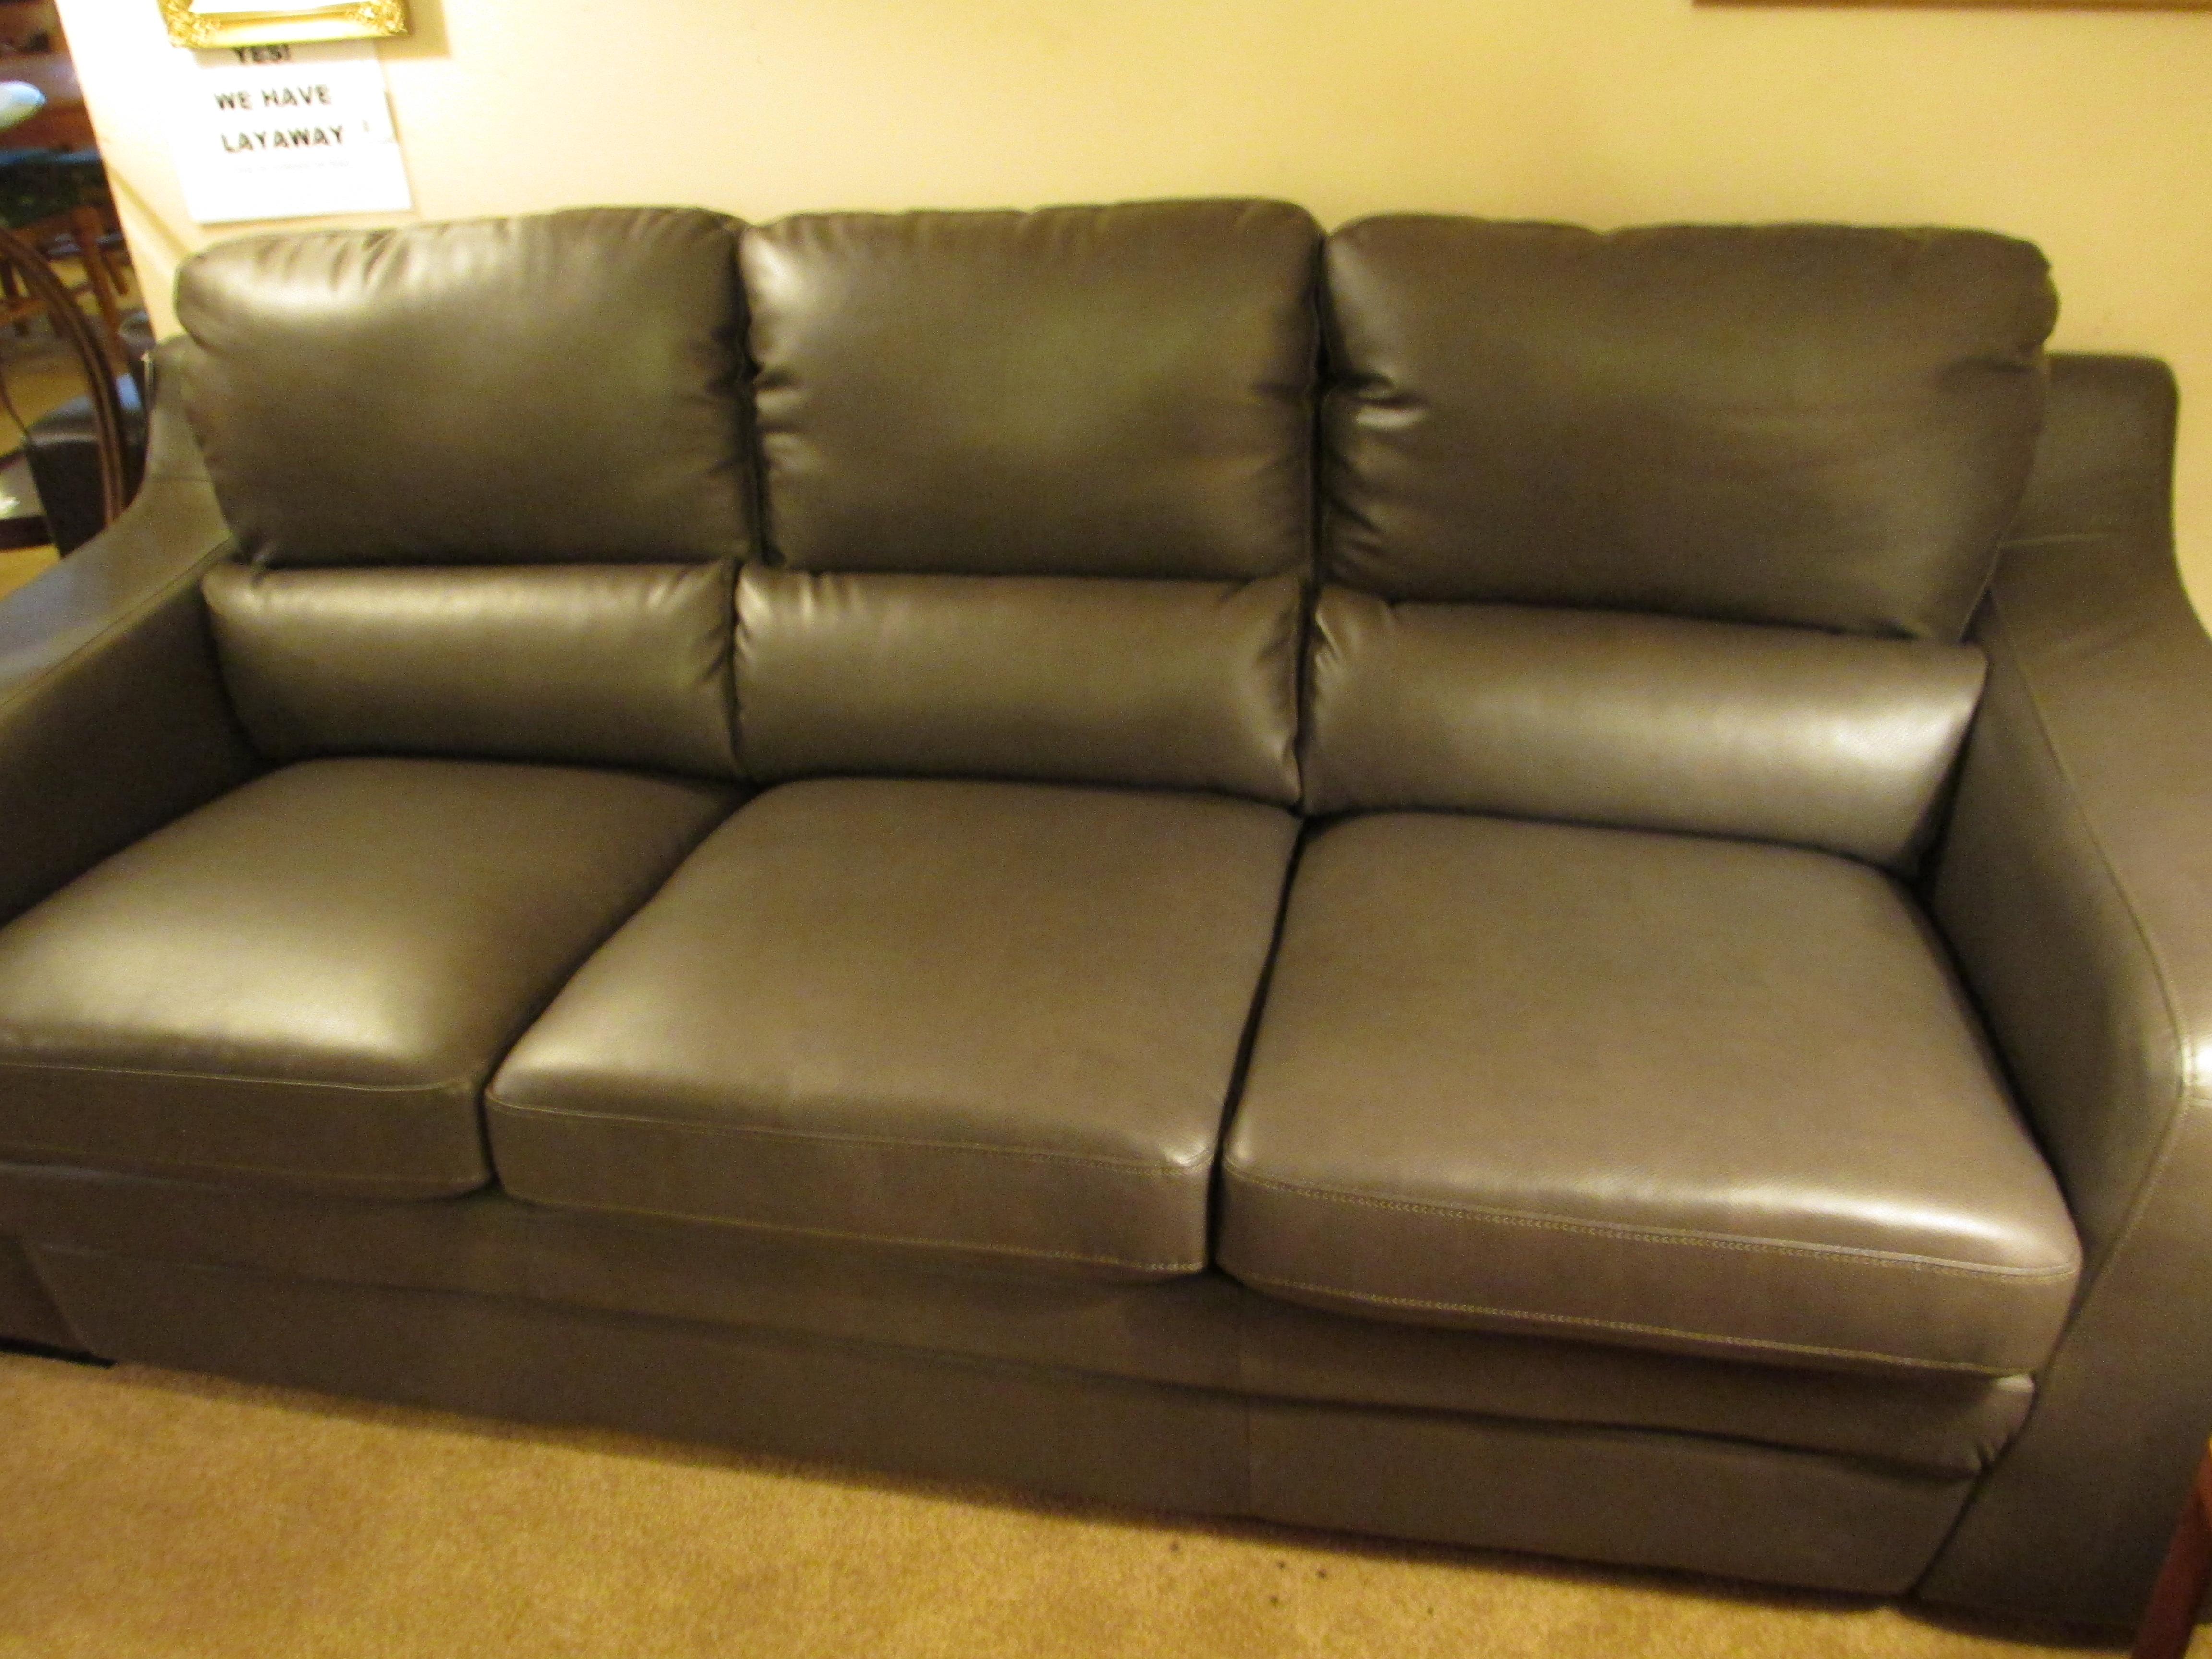 bergamo sectional leather modern sofa gray pit uk kasala | brokeasshome.com